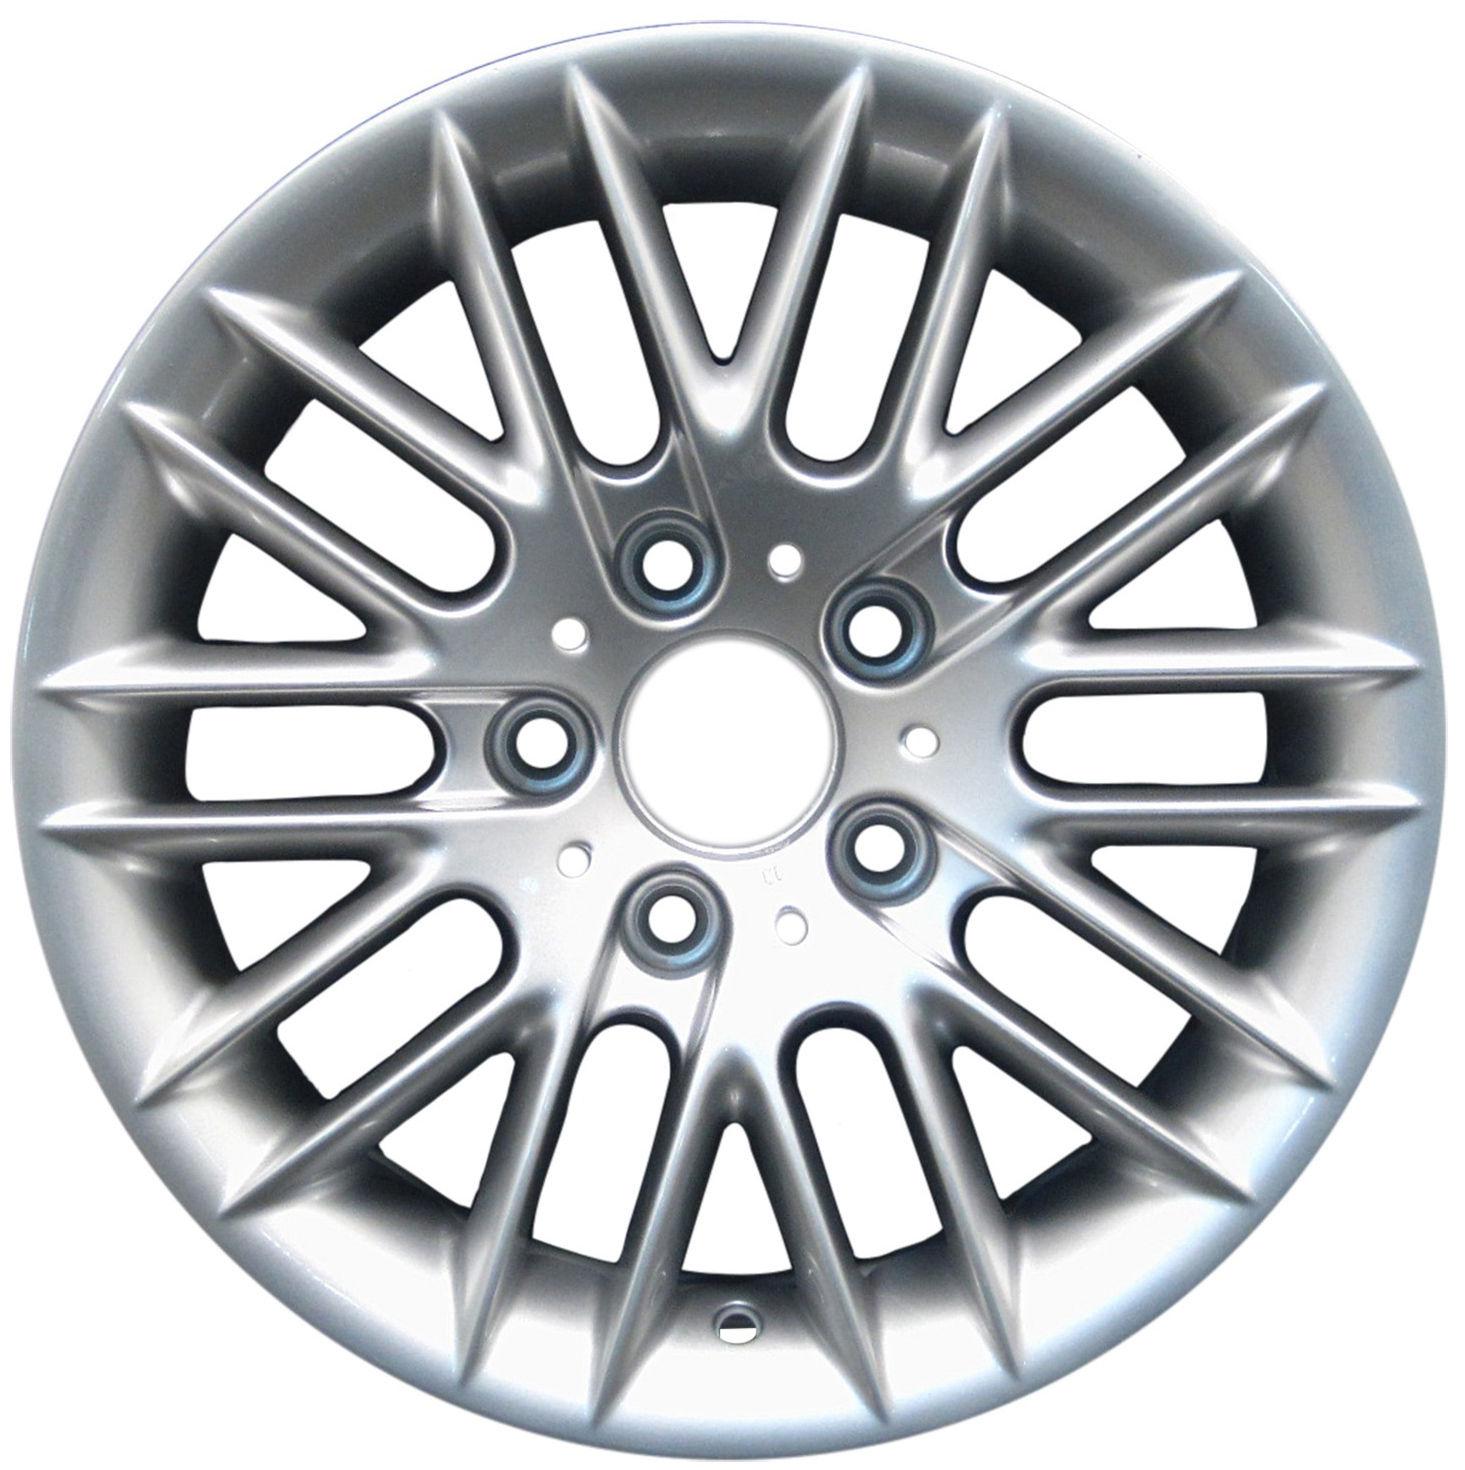 bmw styles style inch am htm kingofrimsmy rim design p msport end sale new